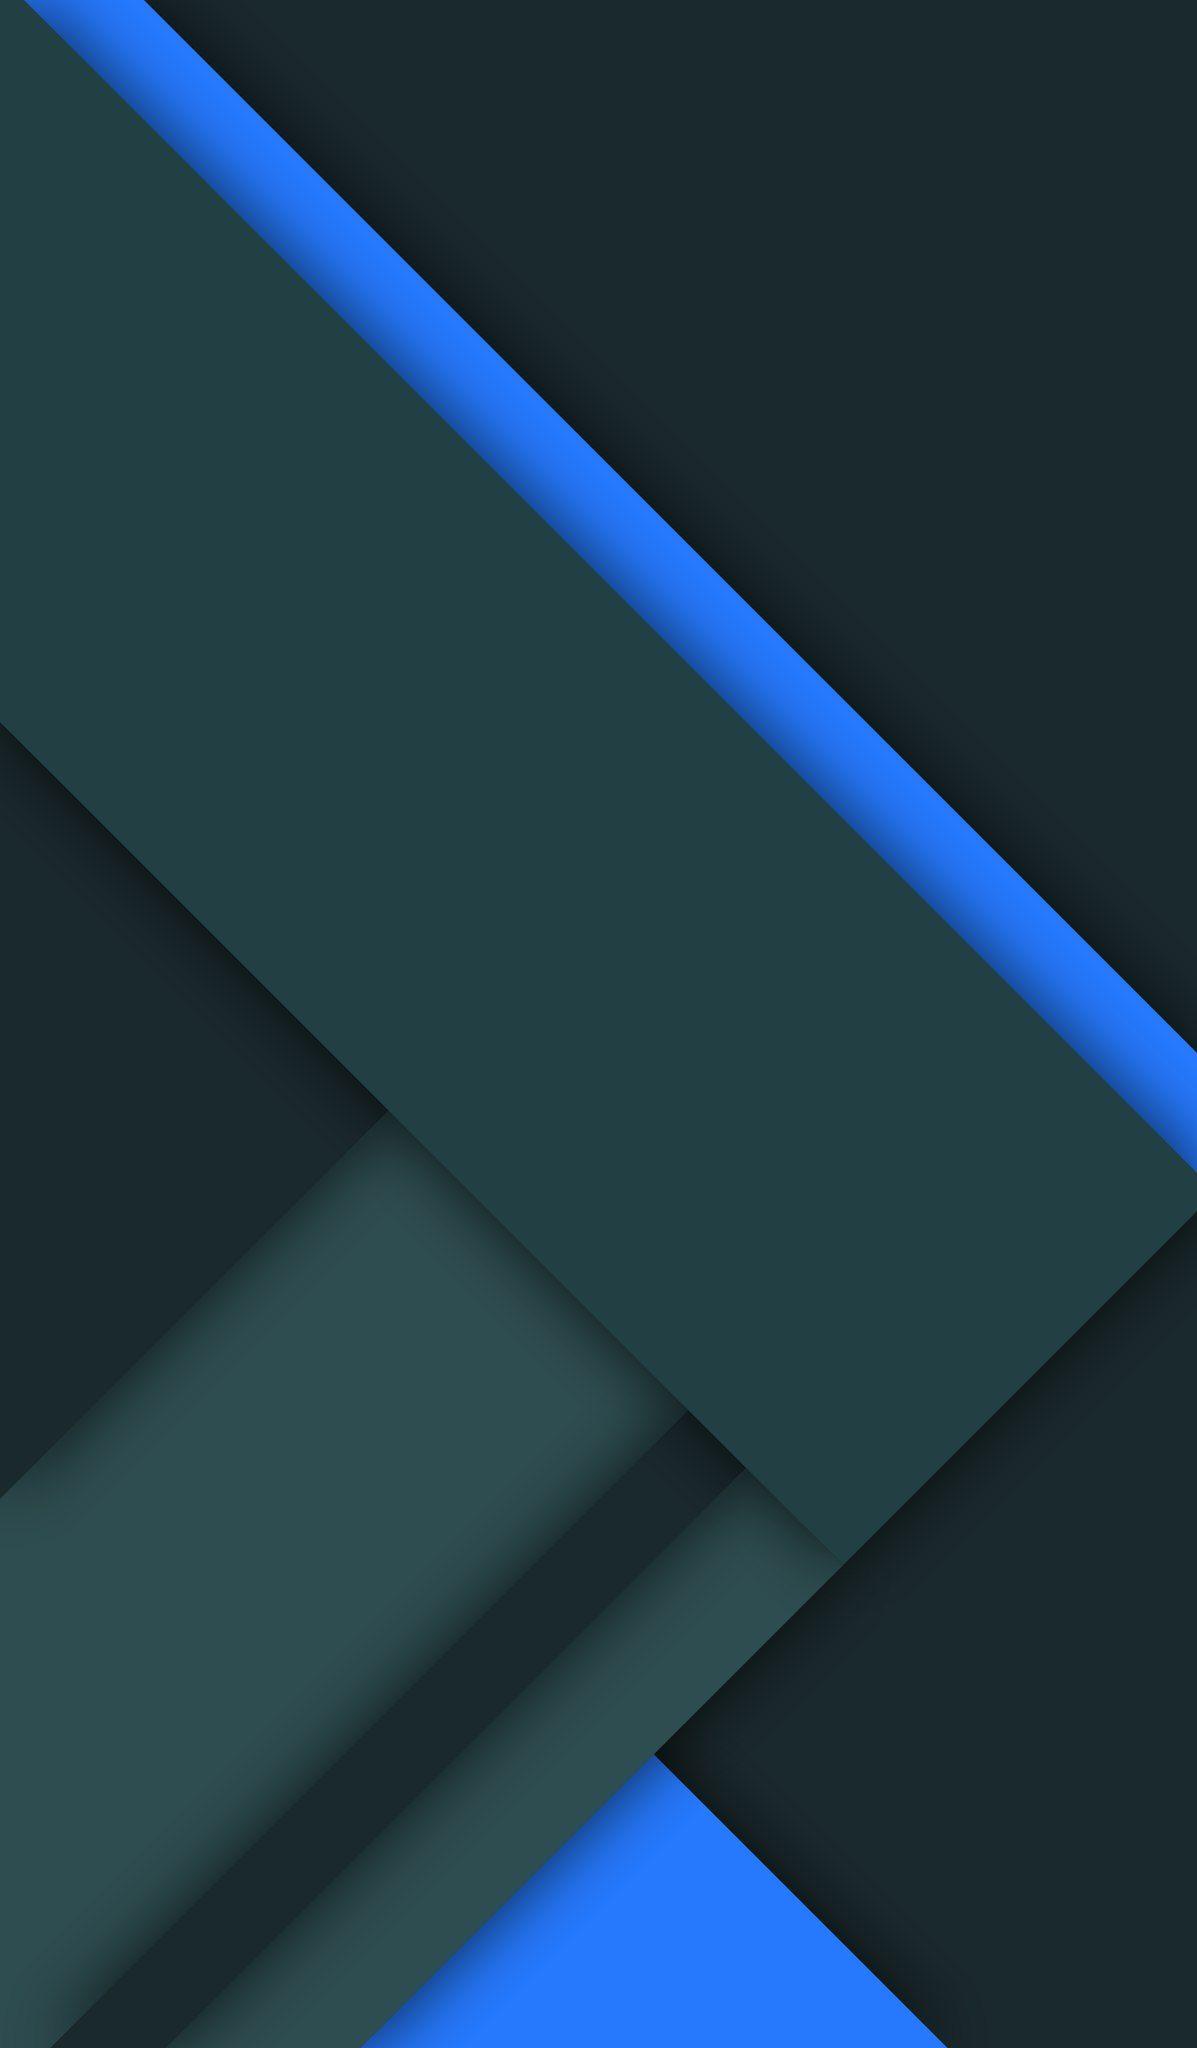 Material Design Blue Wallpaper | www.pixshark.com - Images ...